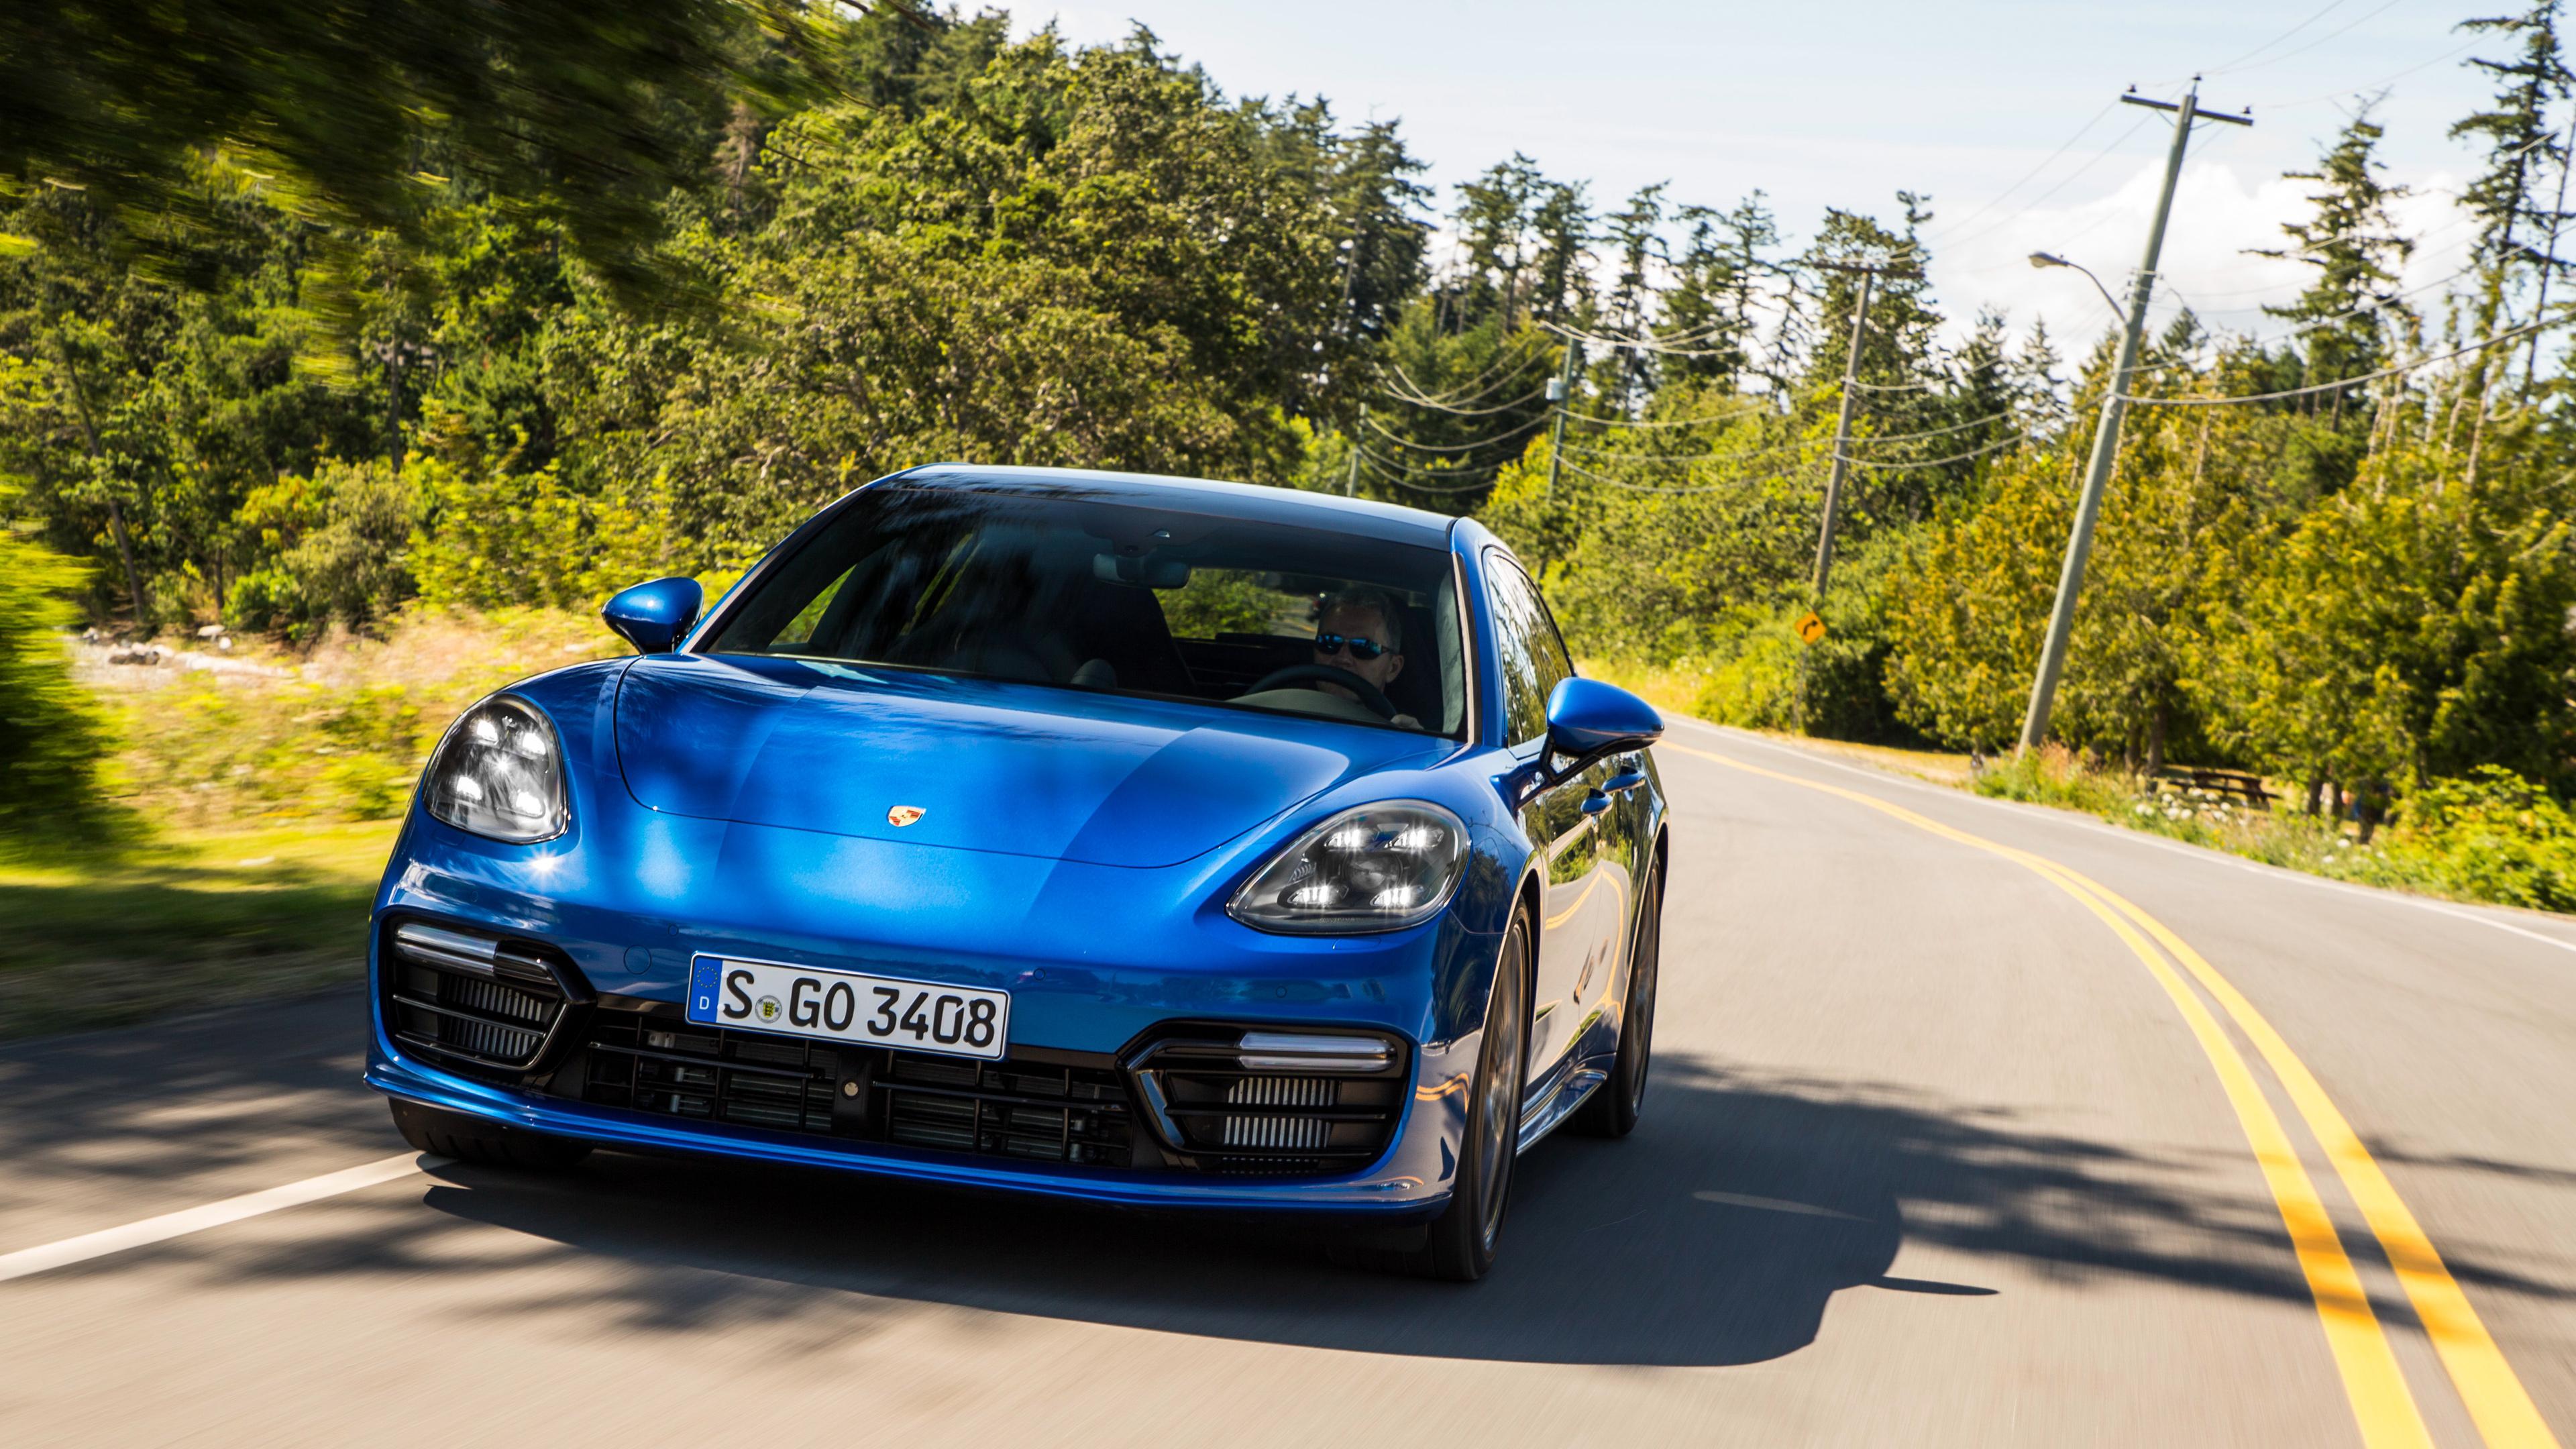 Porsche Panamera Turbo Sport Turismo 2017 4K